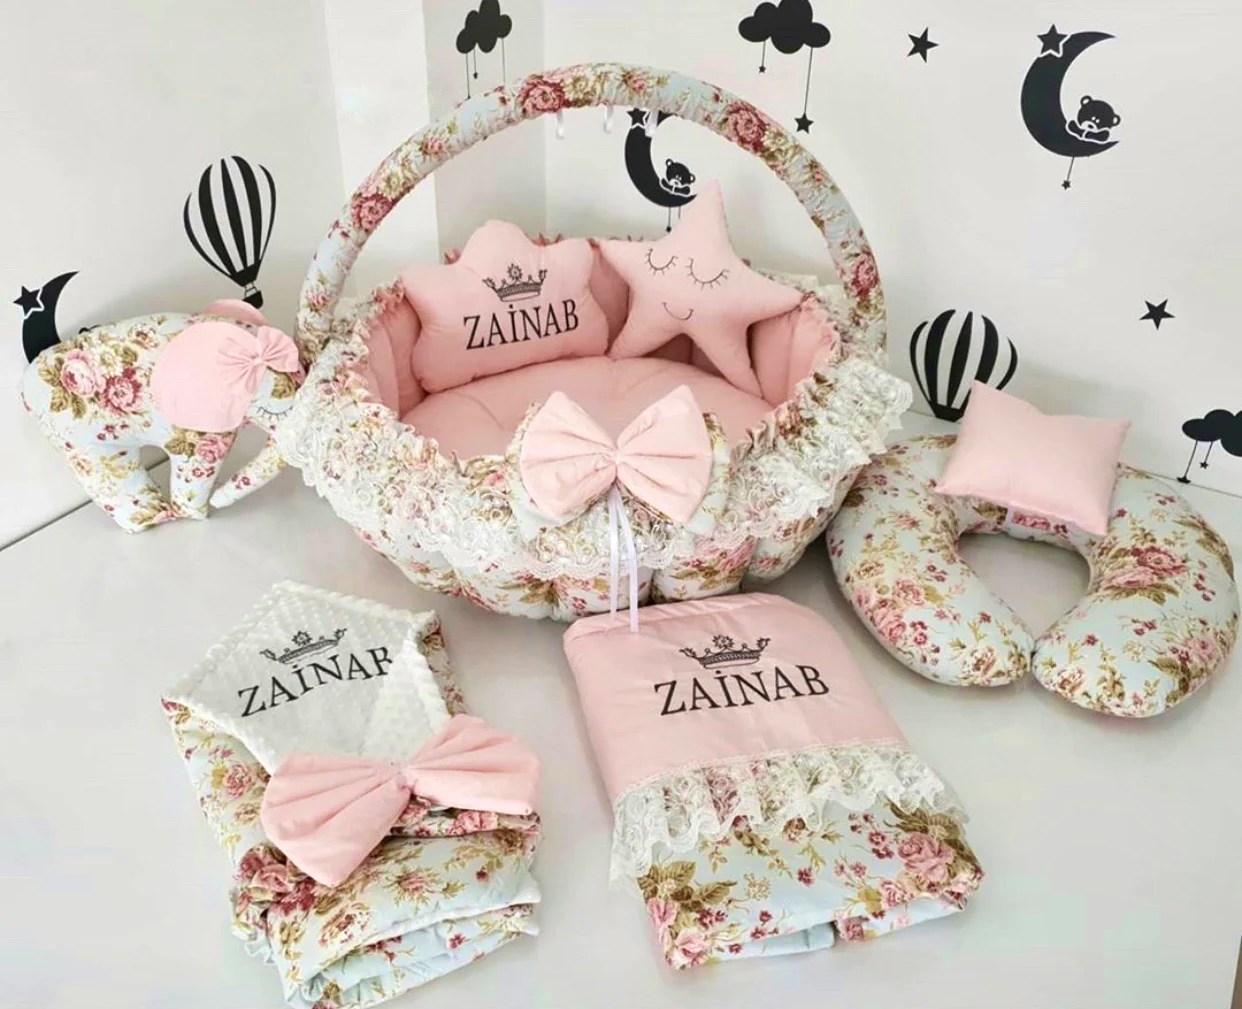 newborn floral garden personalized baby nest play mat nursing pillow swaddle blanket gift set